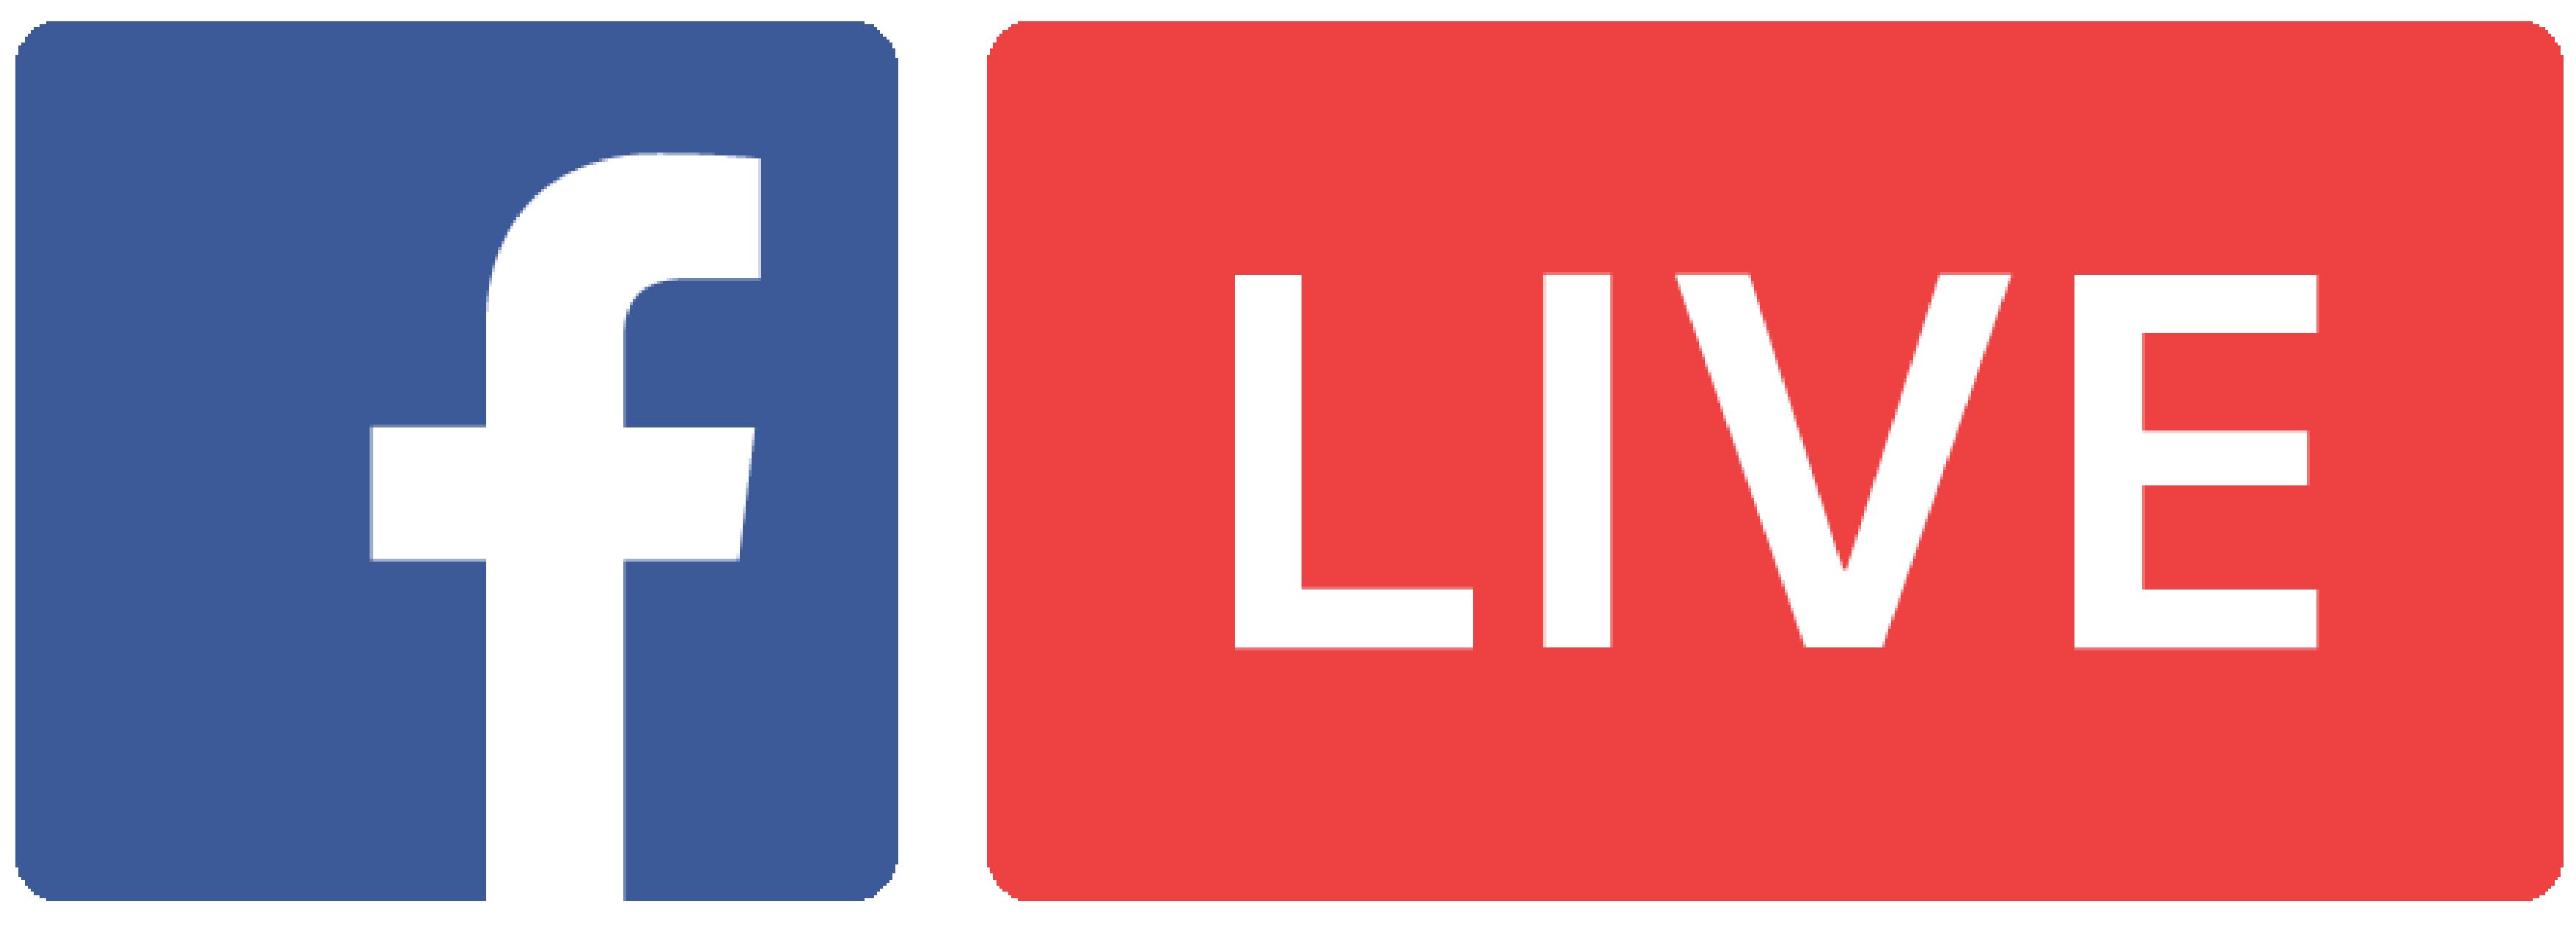 Live Stream Pre Recorded Videos To Facebook Live Youtube Twitch Periscope Mixer Smashcast Onestream Liv Facebook Live Vector Logo Free Calendar Template